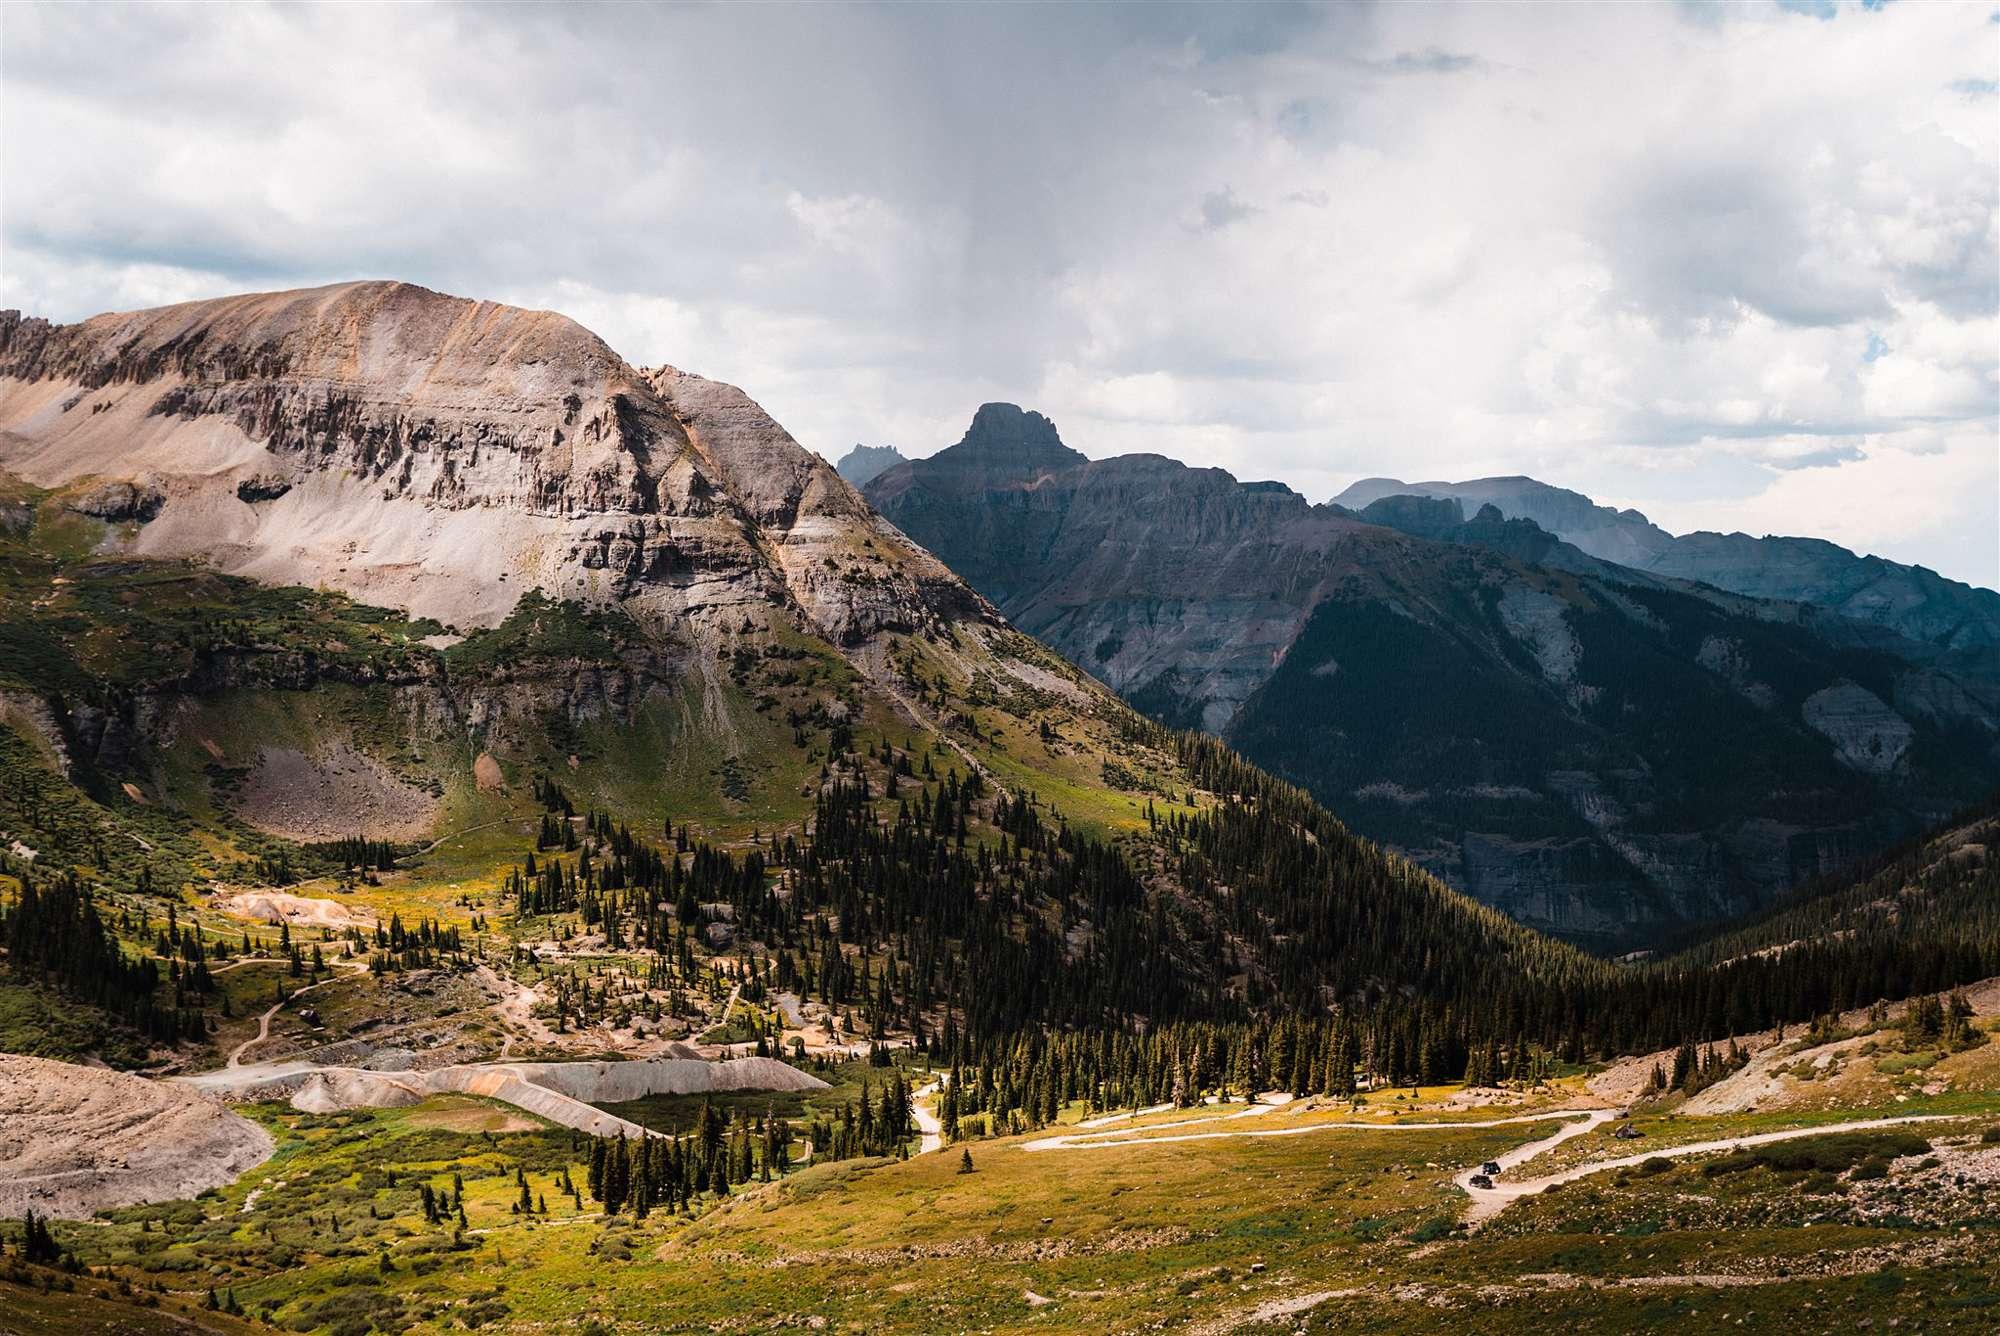 Colorado_Jeeping_Elopement_Emily_Matt_The_Foxes_Photography_0014.jpg